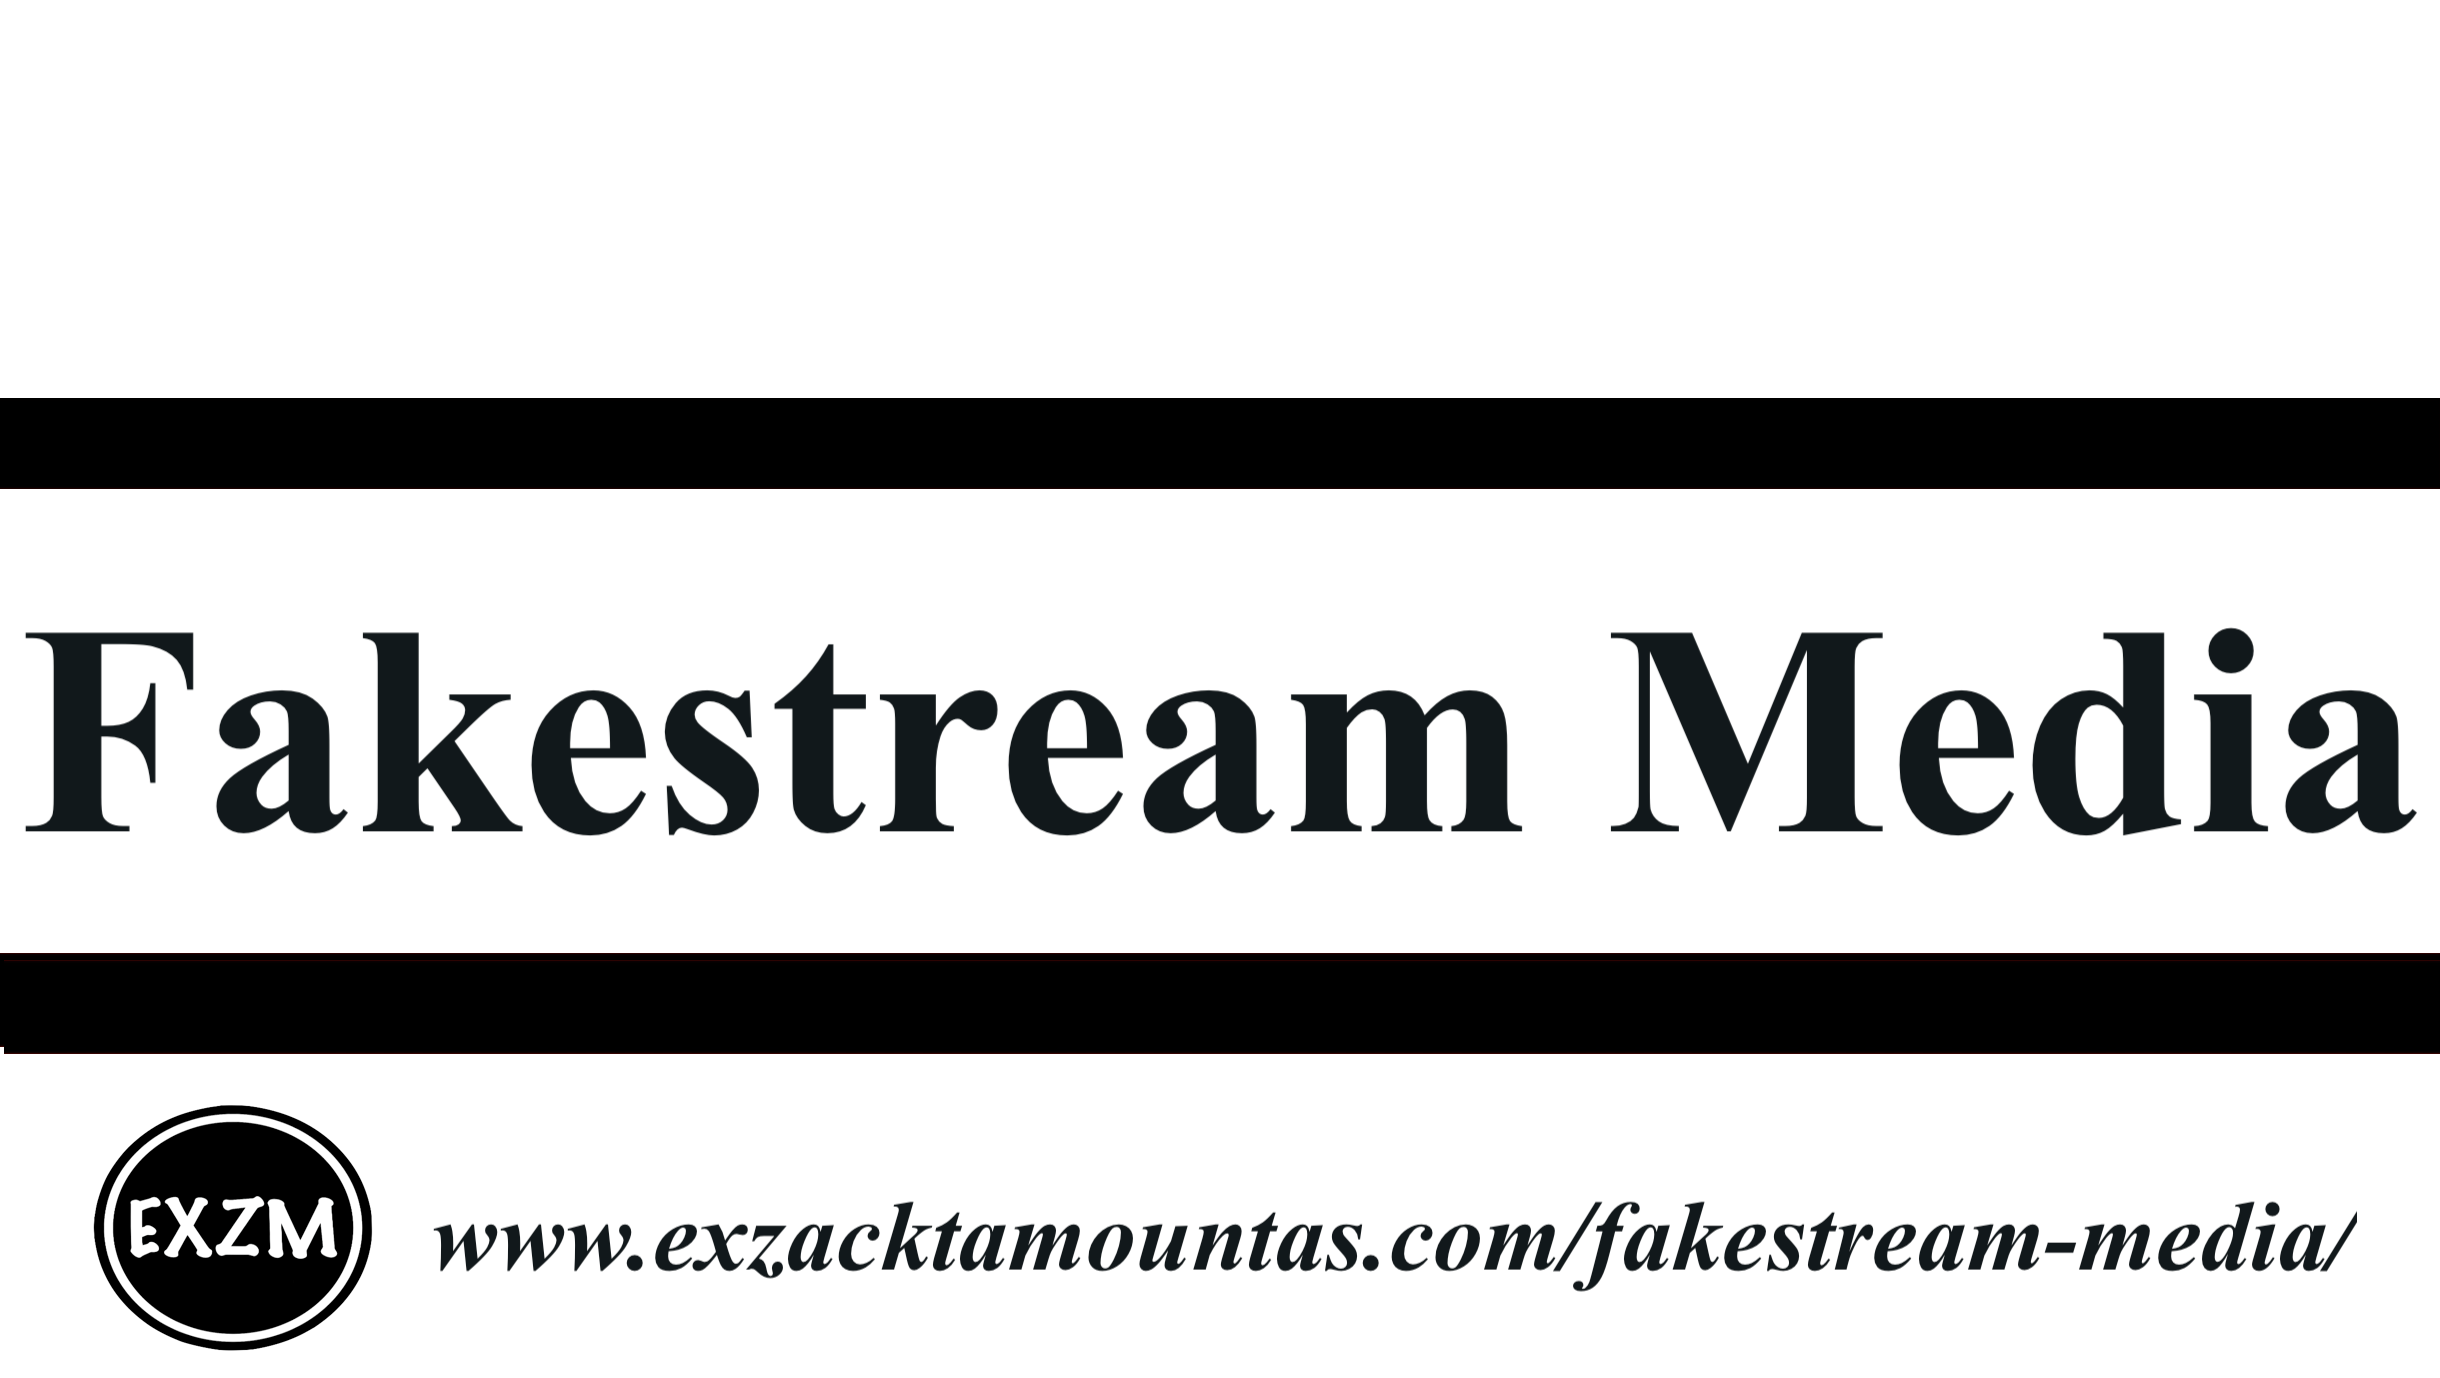 Fakestream Media EXZM 10 4 2019